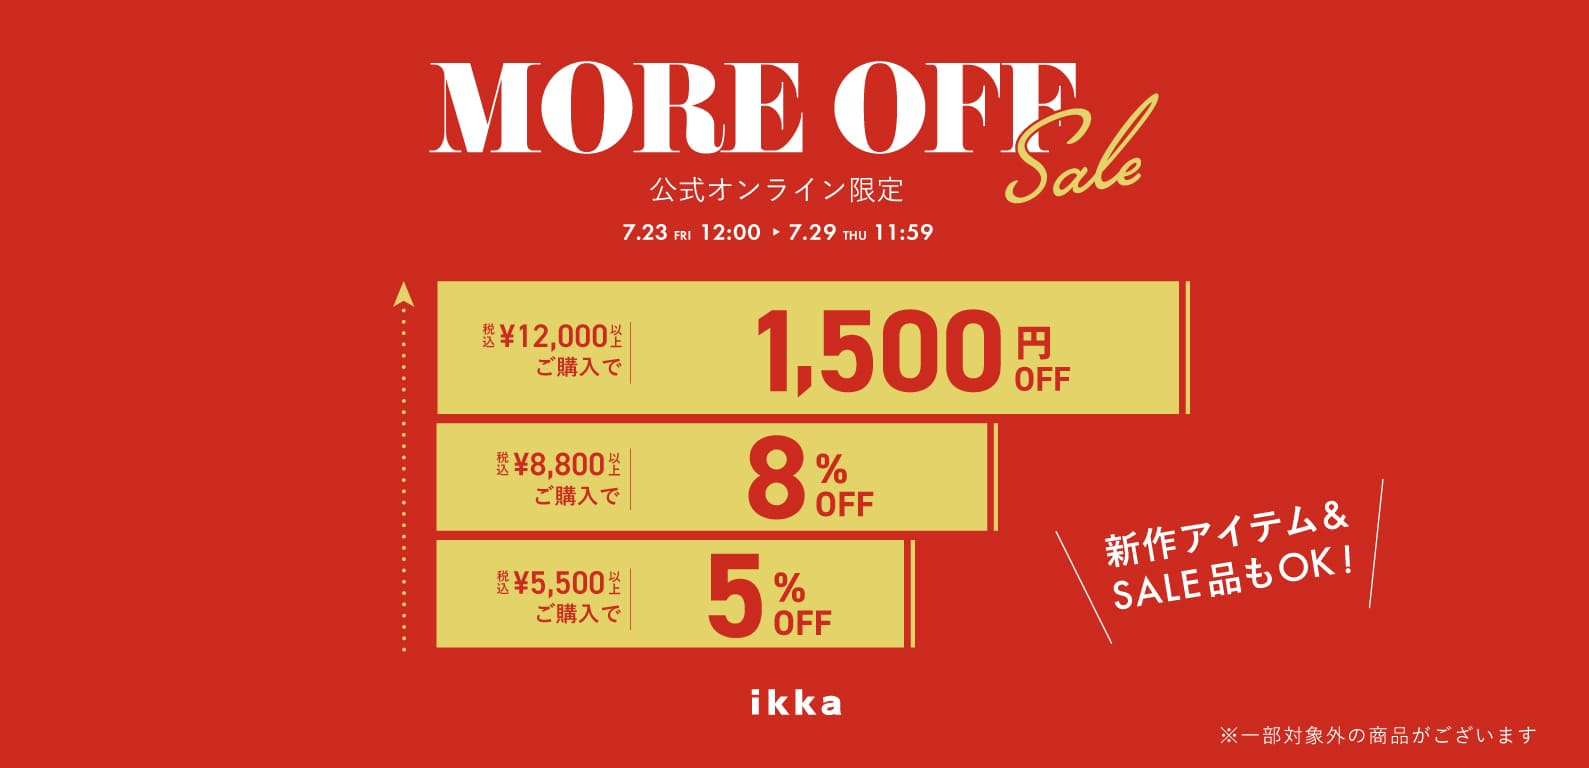 ikka | MORE OFF キャンペーン SALE